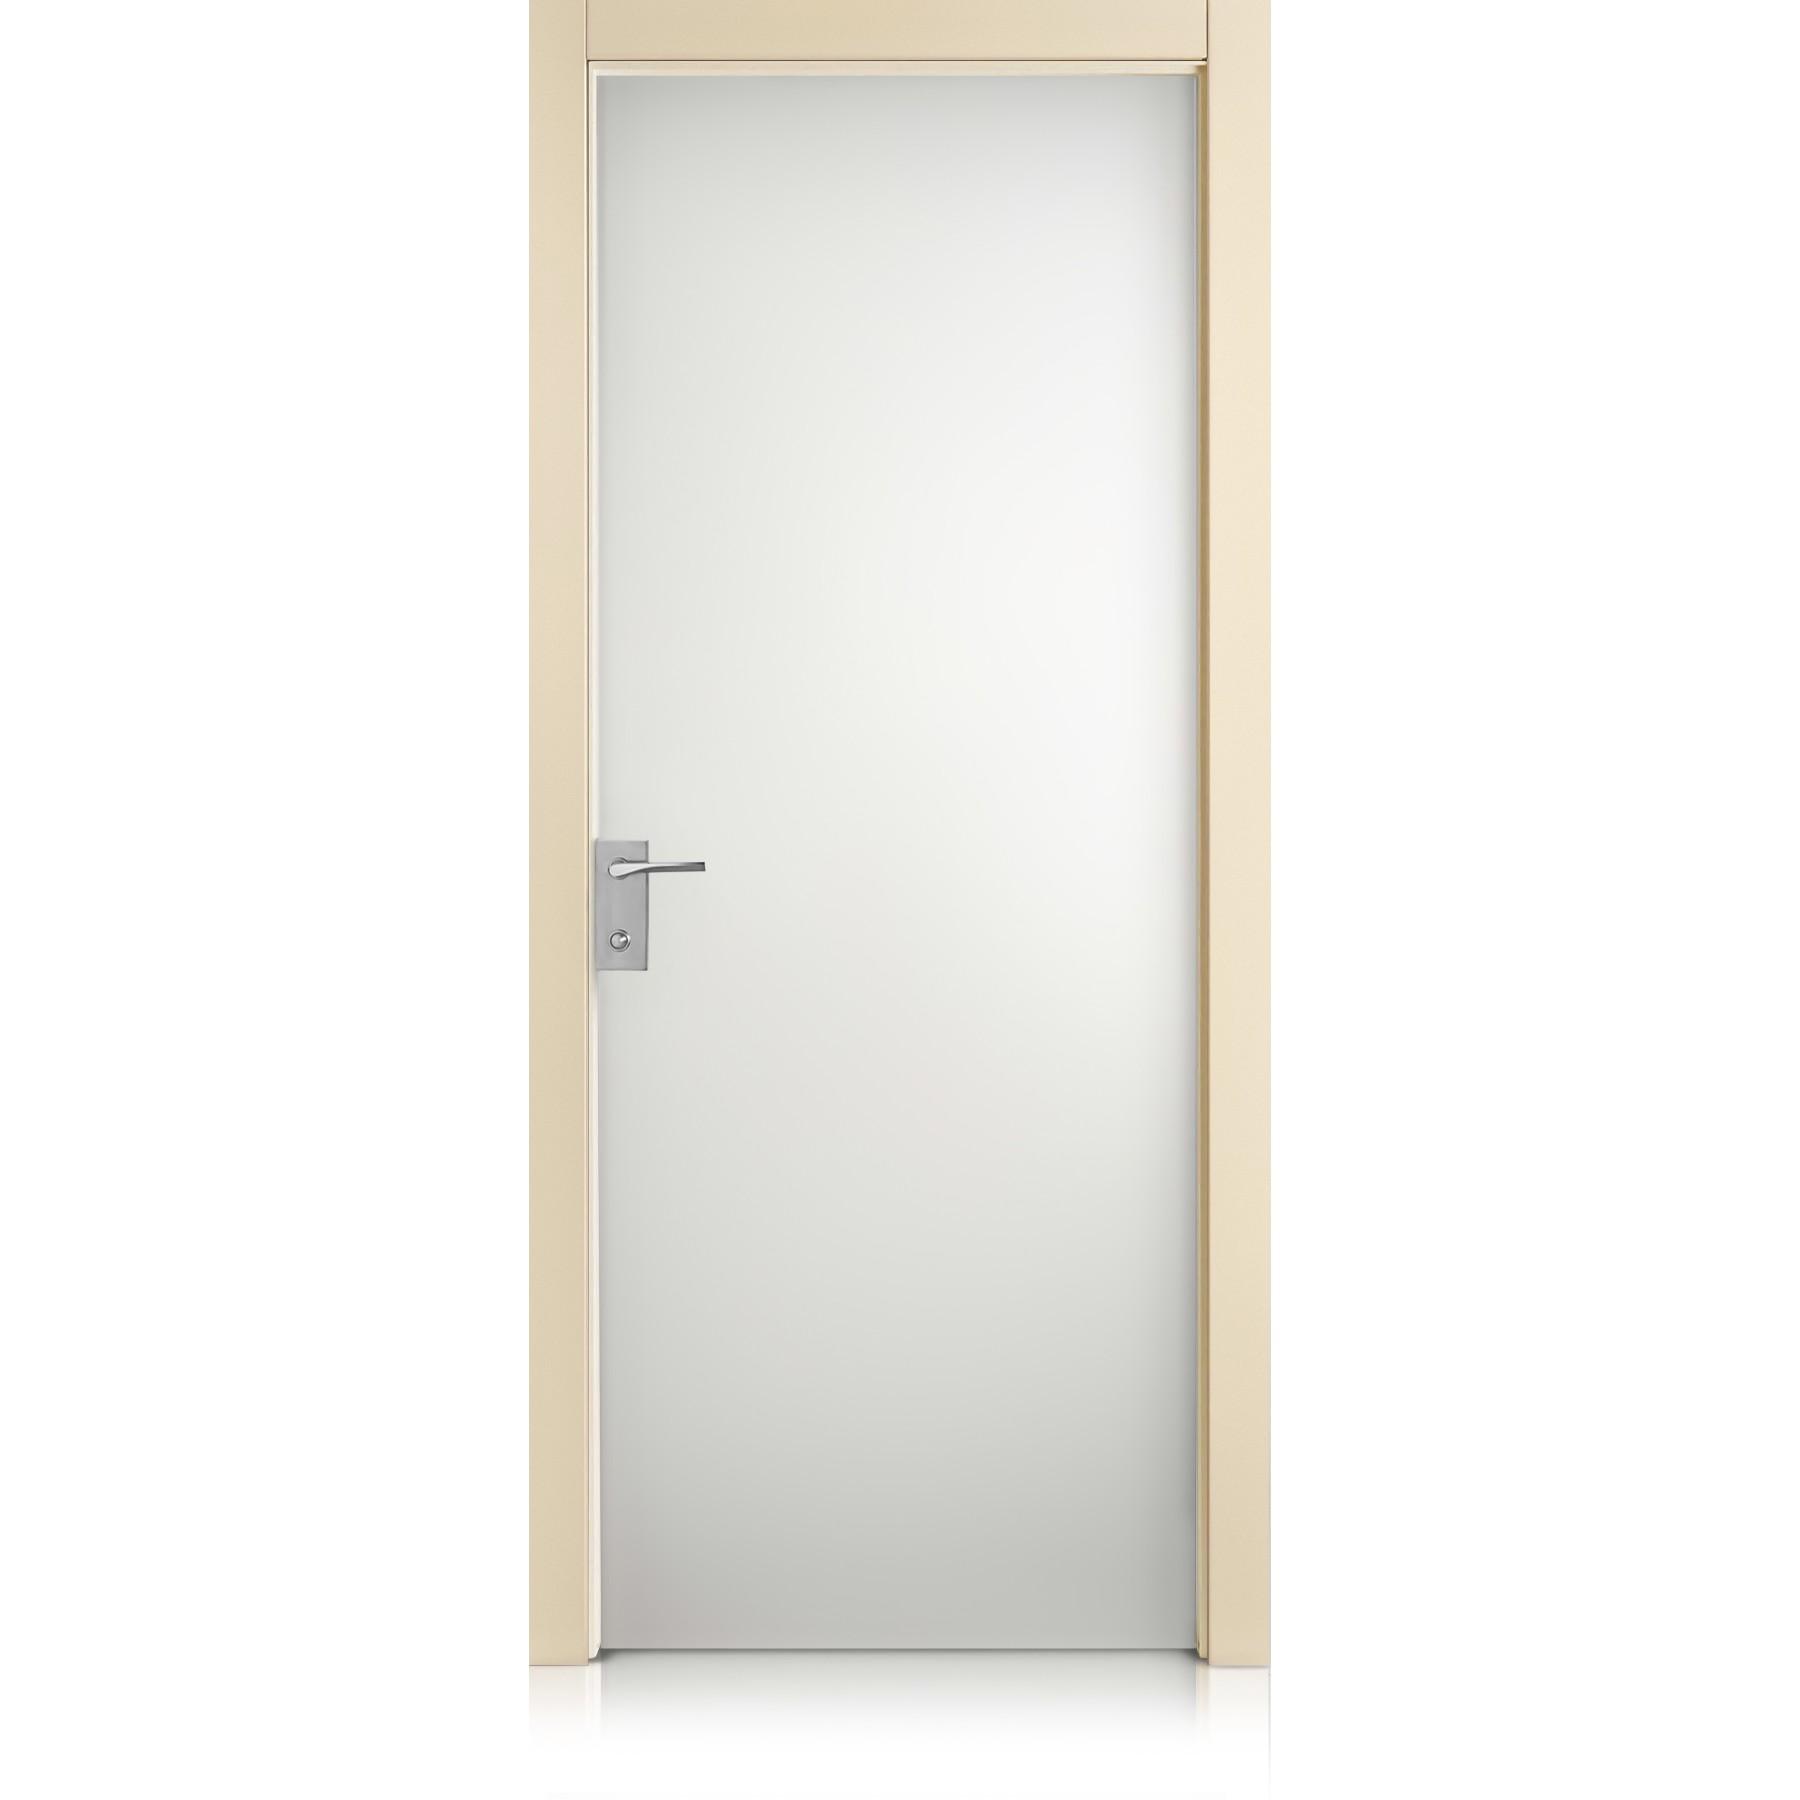 Cristal Basic cremy door